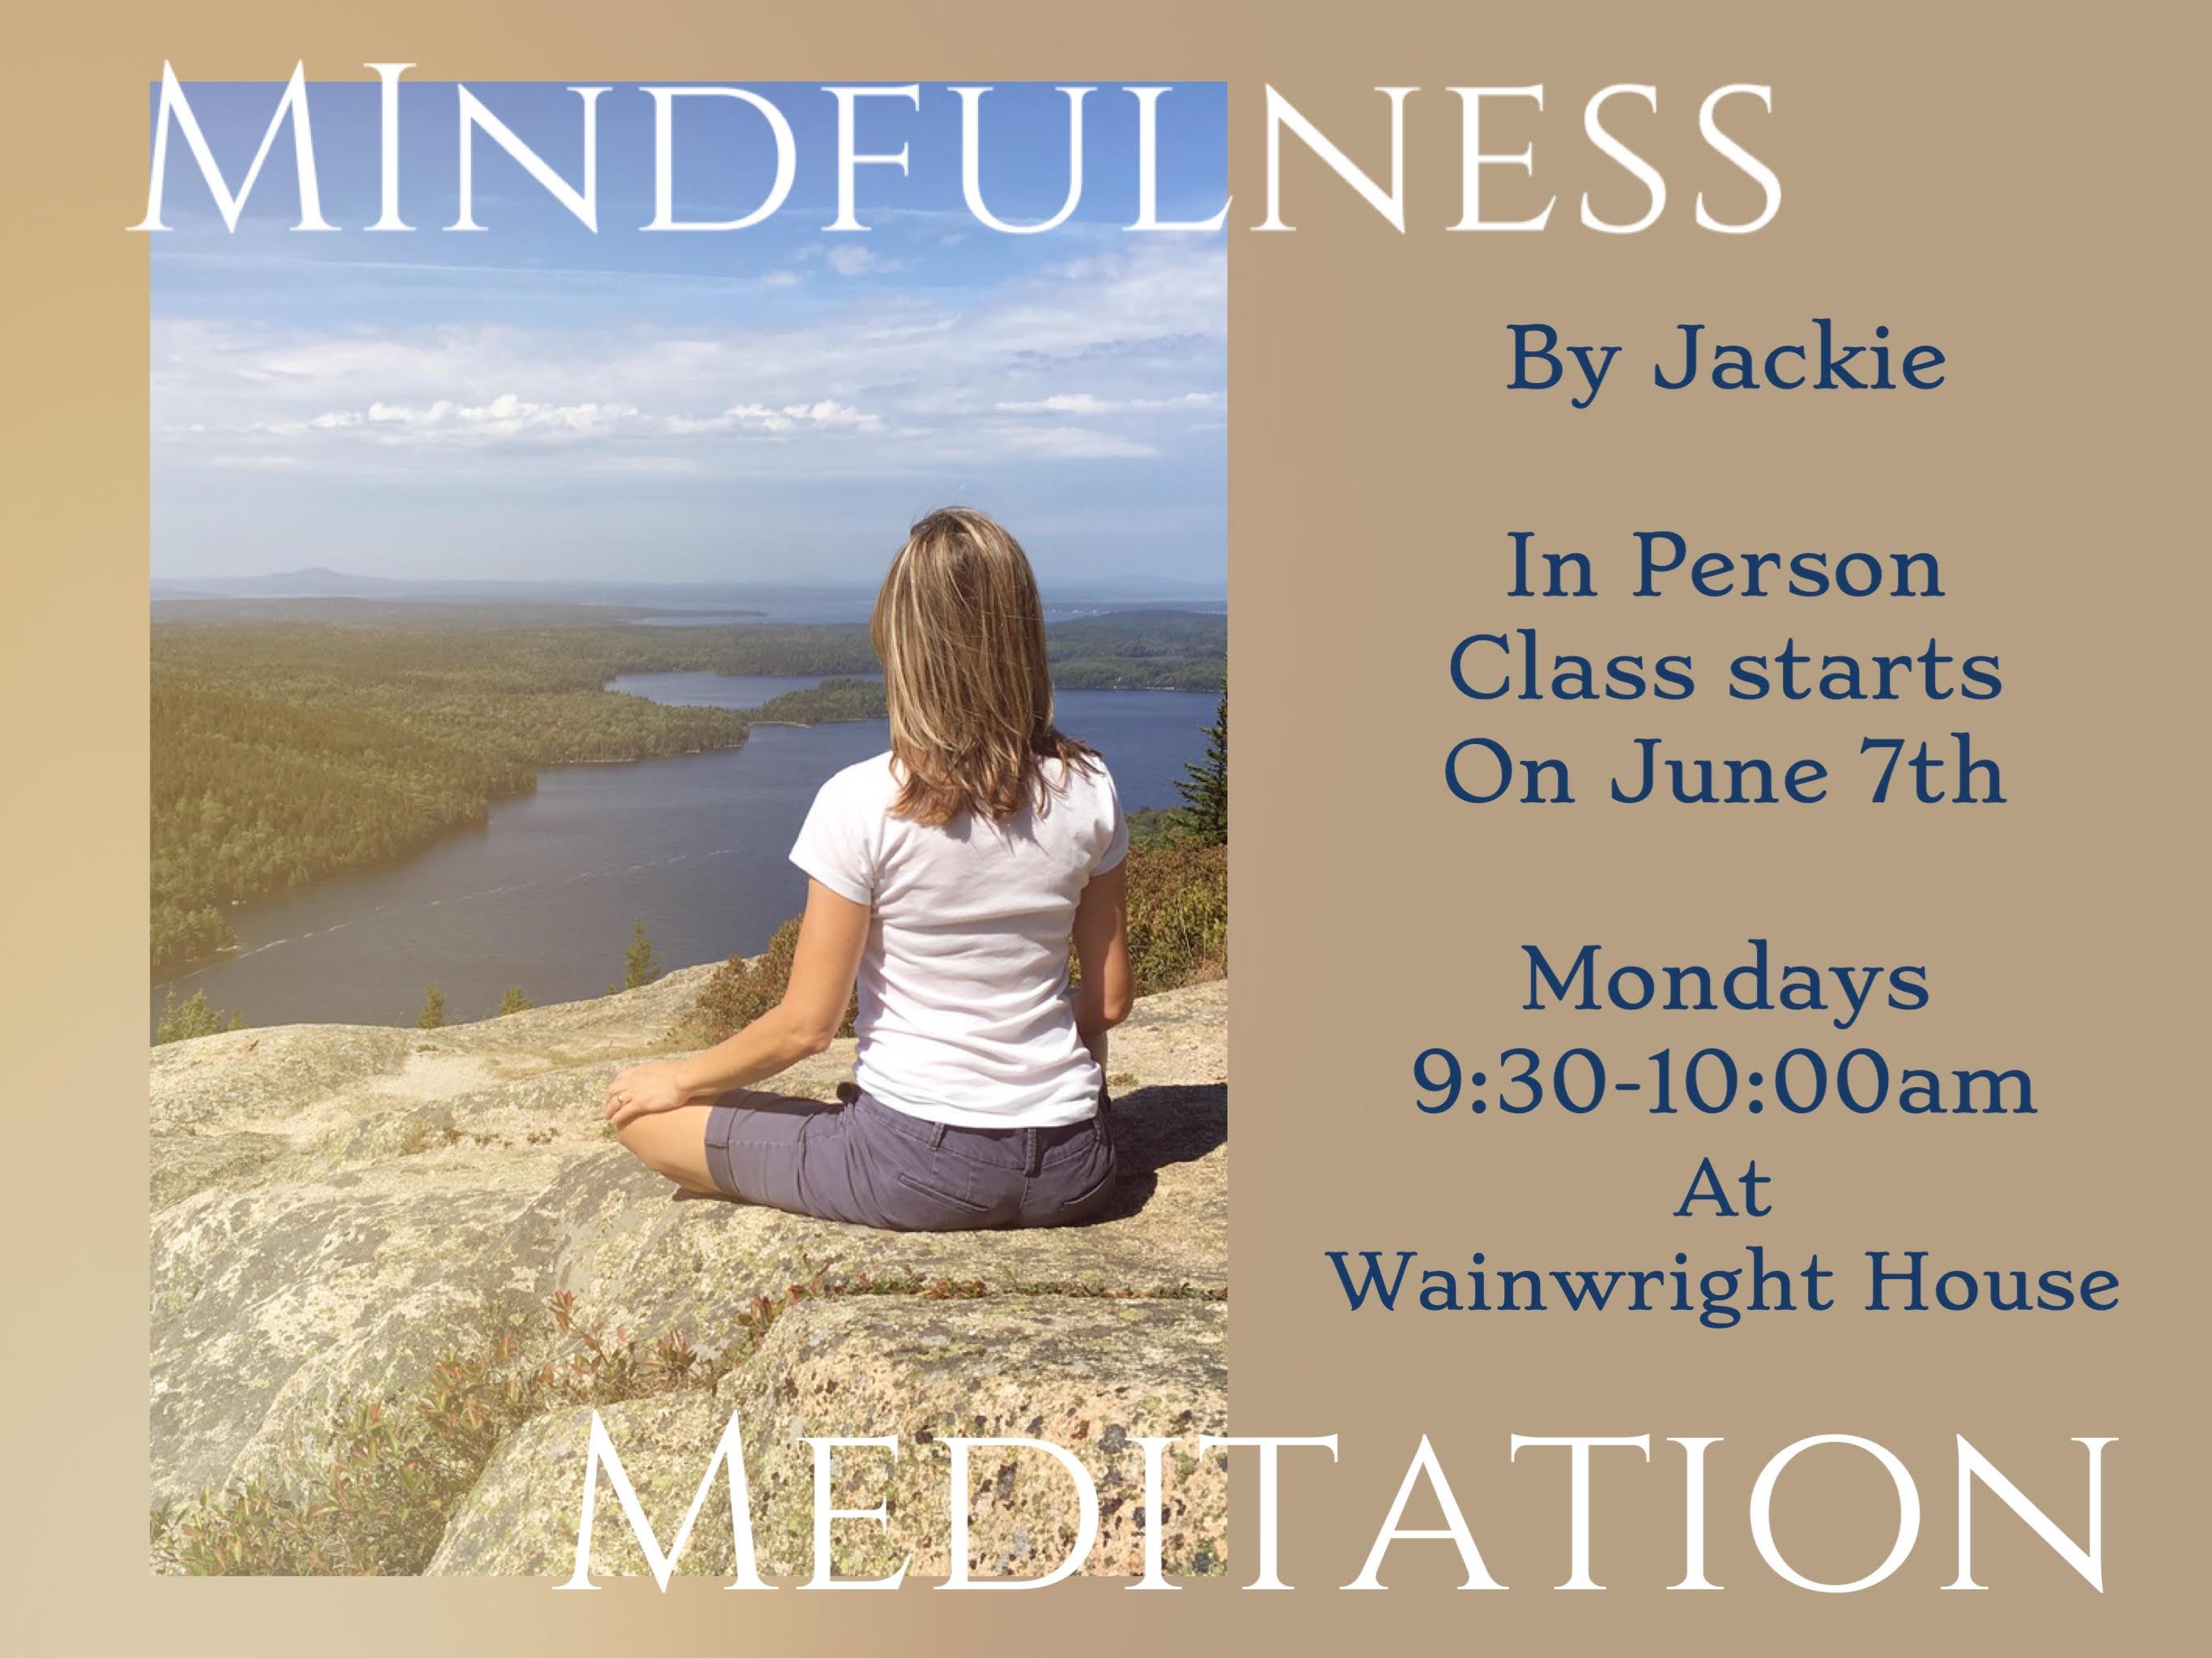 Mindfulness Meditation: 9:30-10:00am